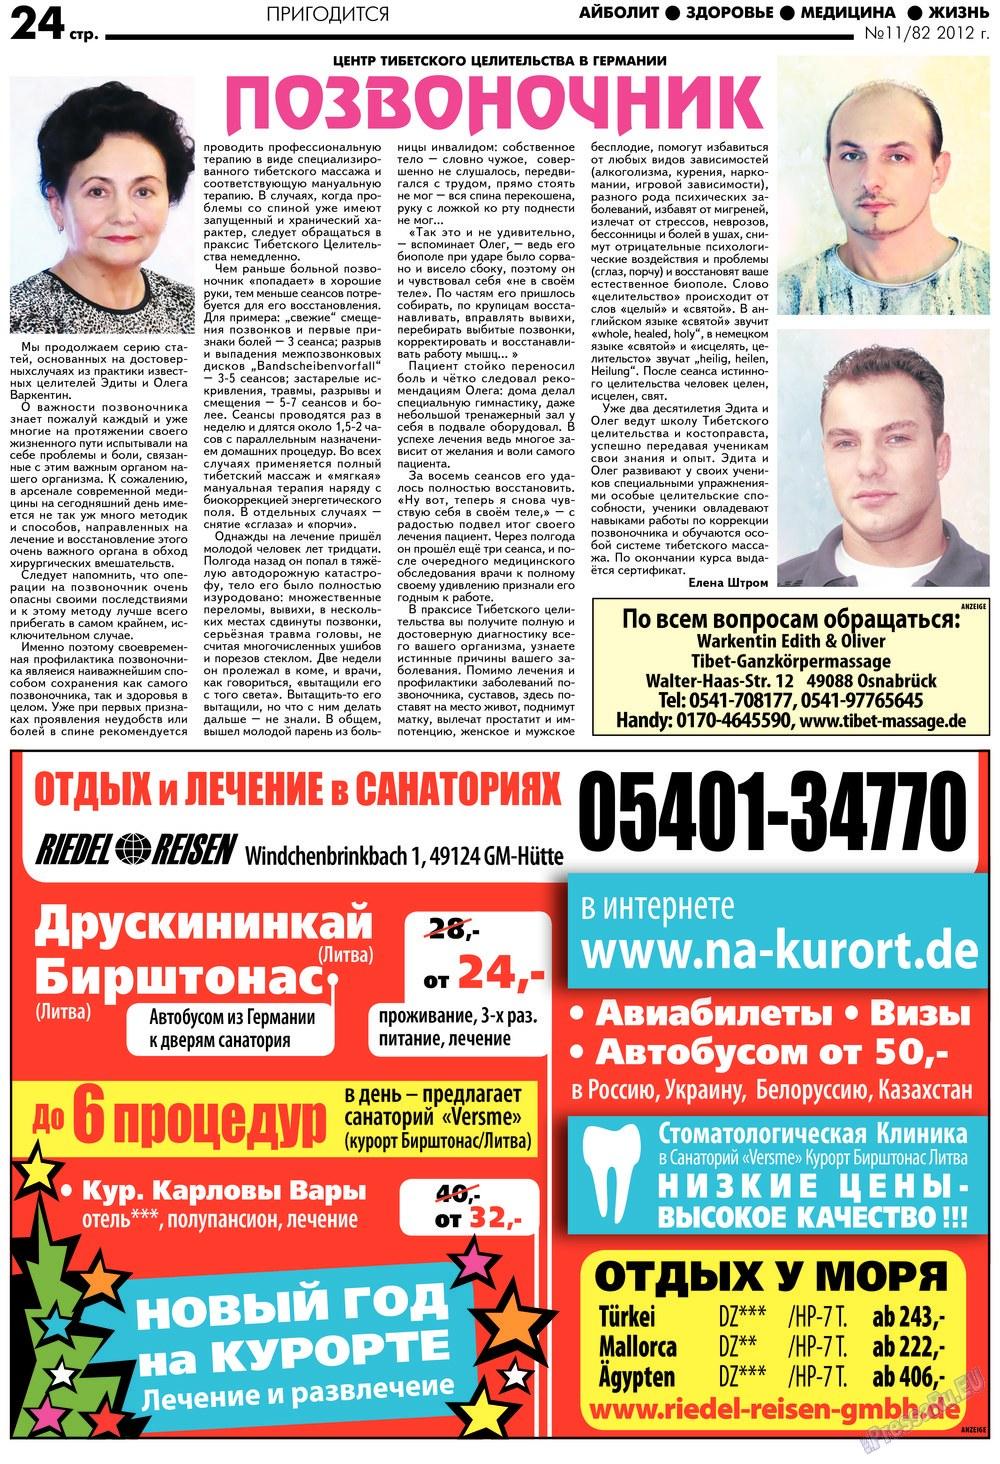 АйБолит (газета). 2012 год, номер 11, стр. 24